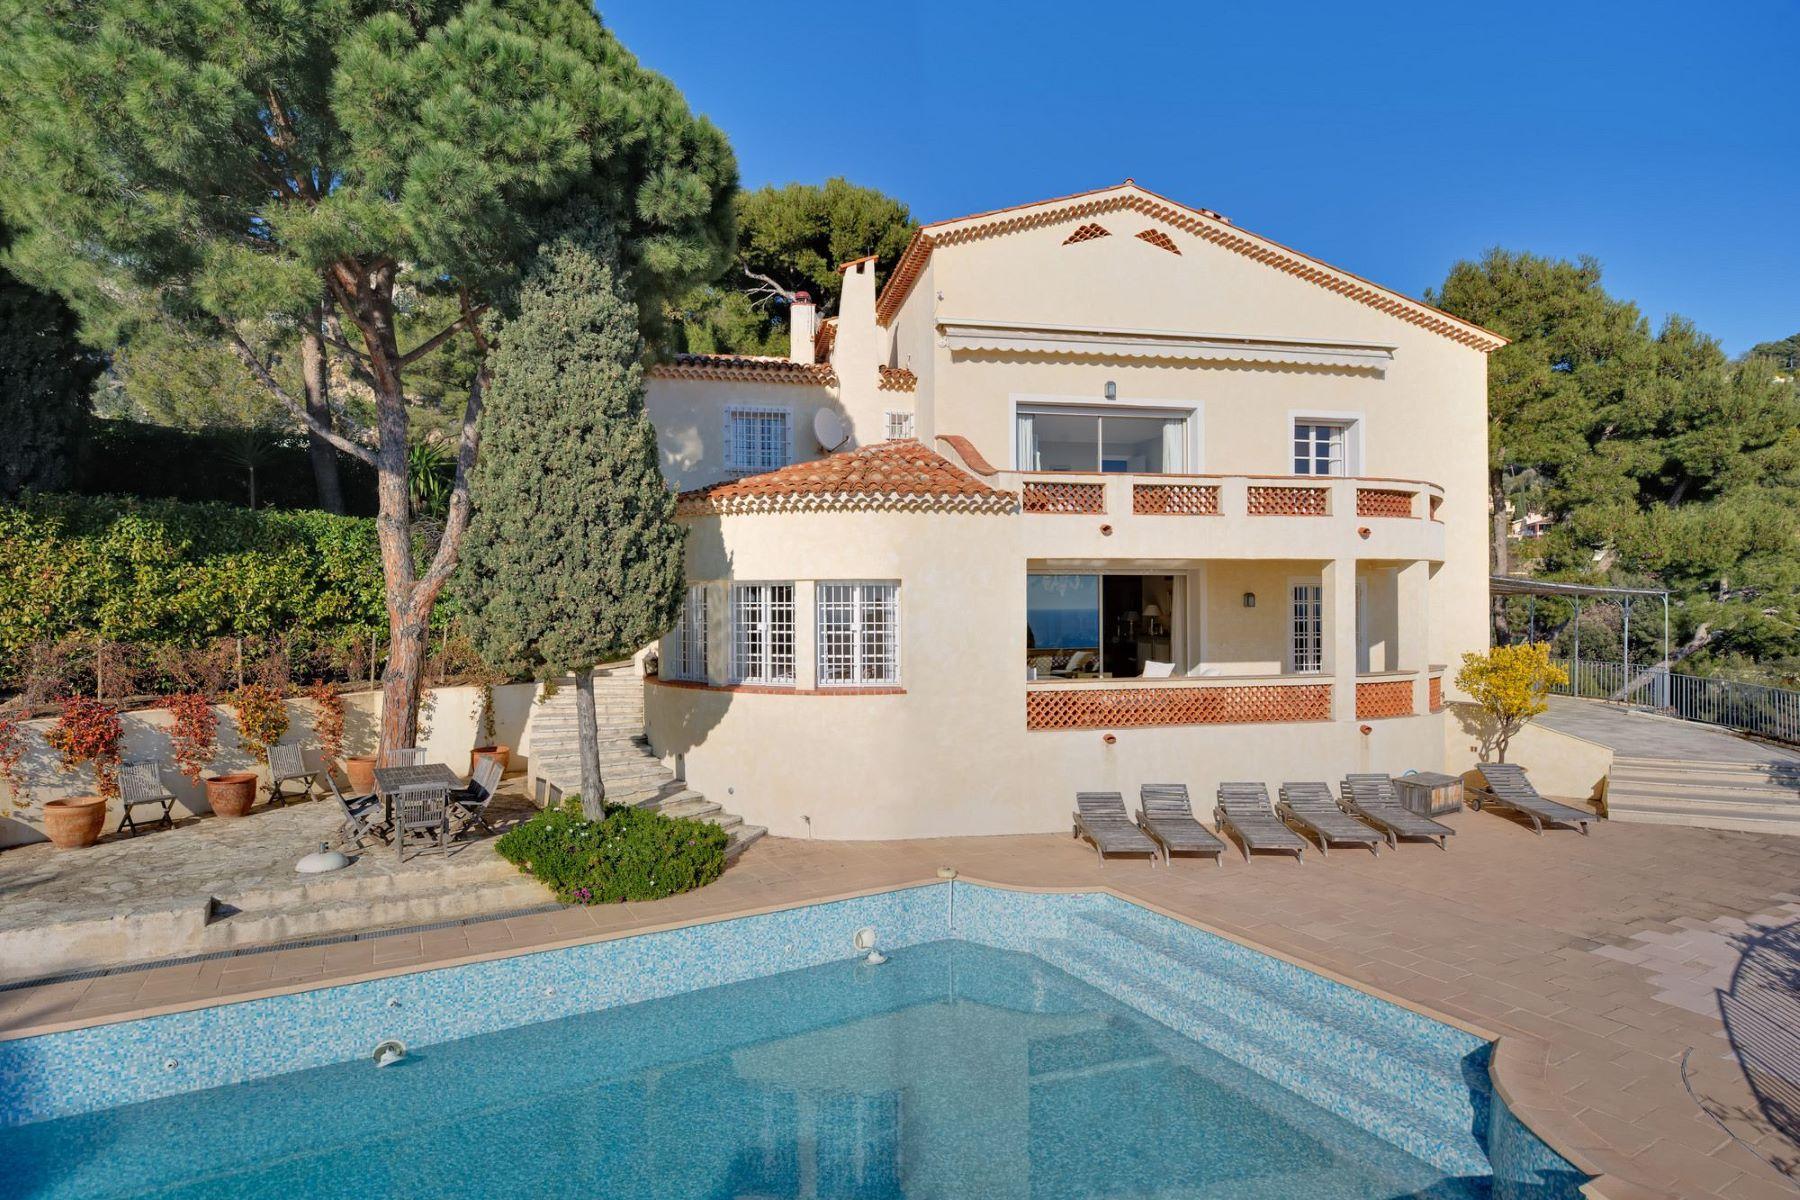 Single Family Homes por un Venta en Sole agent - elegant property with panoramic sea views - Villefranche-sur-Mer Villefranche Sur Mer, Provincia - Alpes - Costa Azul 06230 Francia